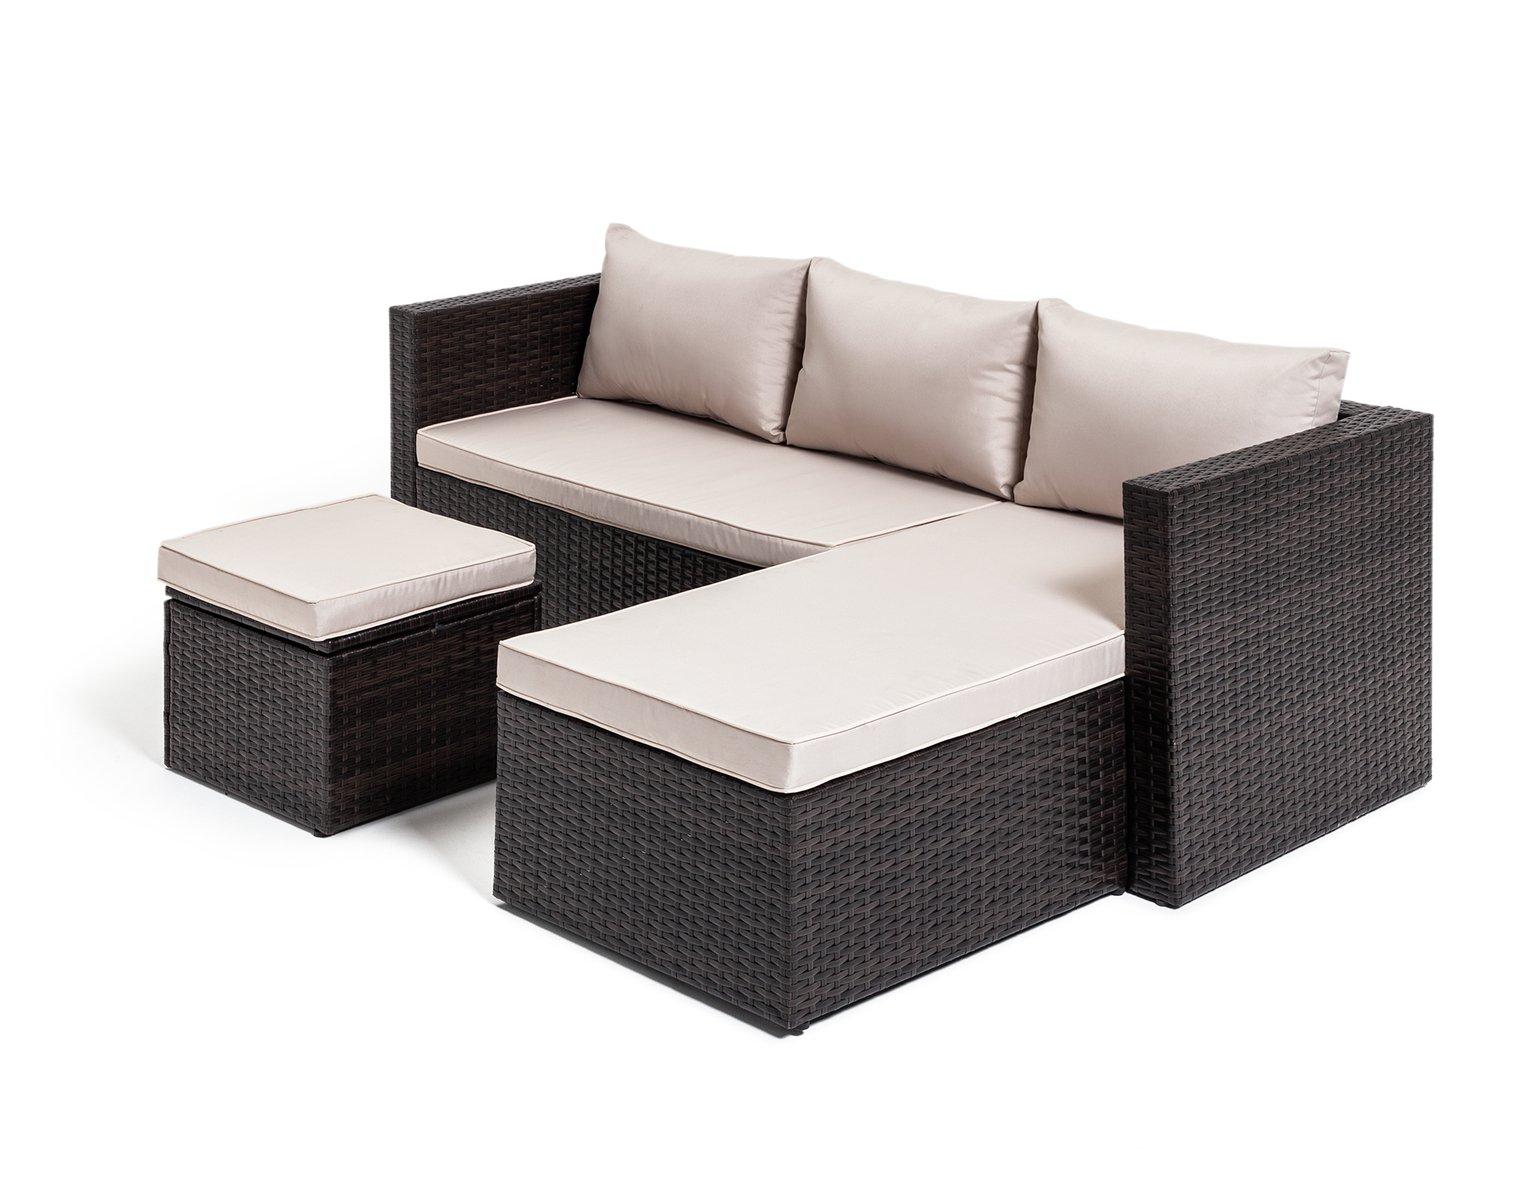 Habitat Mini Corner Sofa Set with Storage - Brown